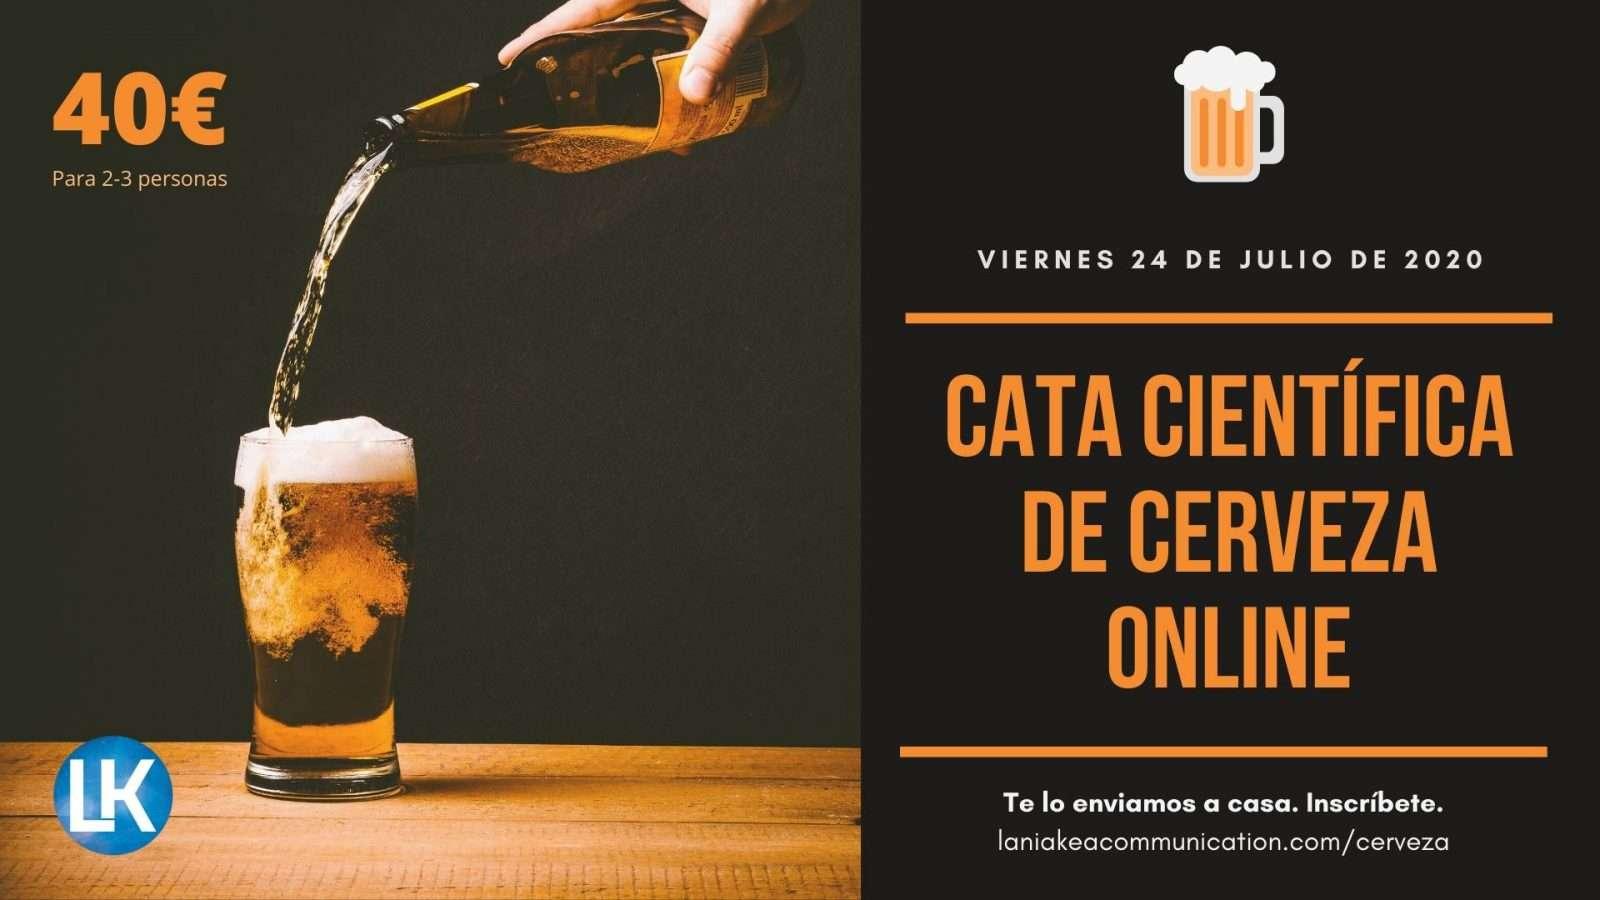 Cata científica de cerveza online – 24 de julio de 2020